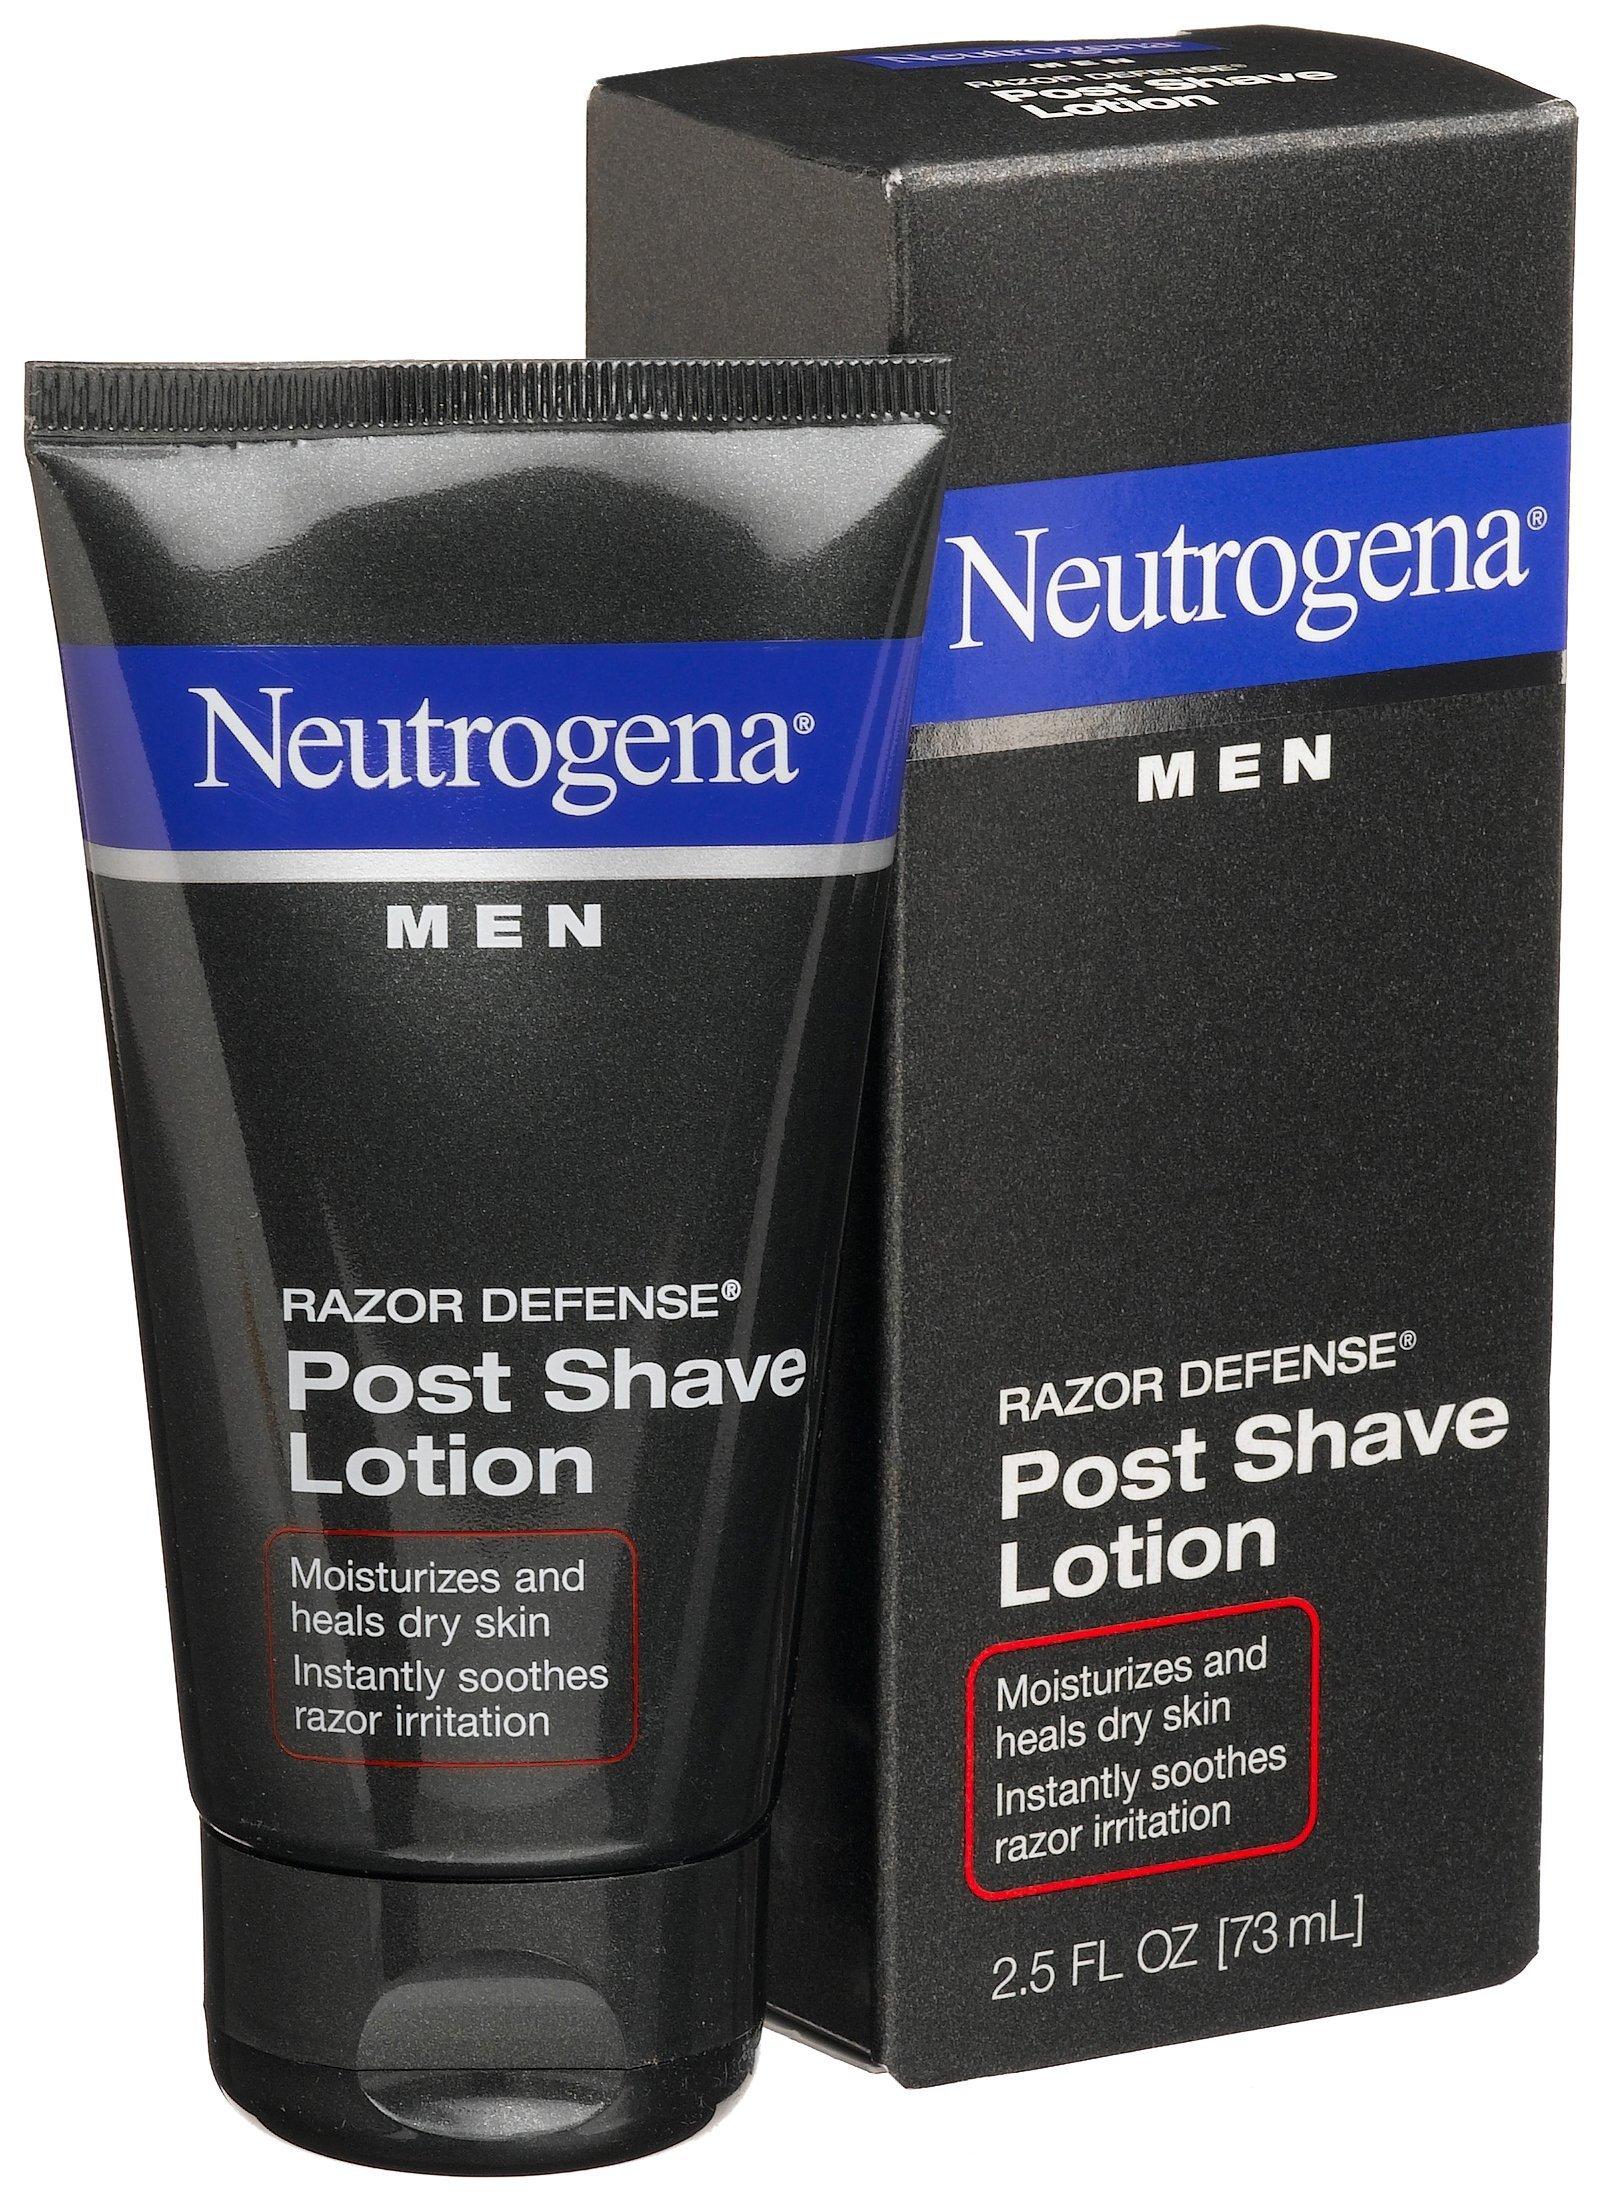 Neutrogena Men Razor Defense Post Shave Lotion, 2.5 Ounce (Pack of 4)